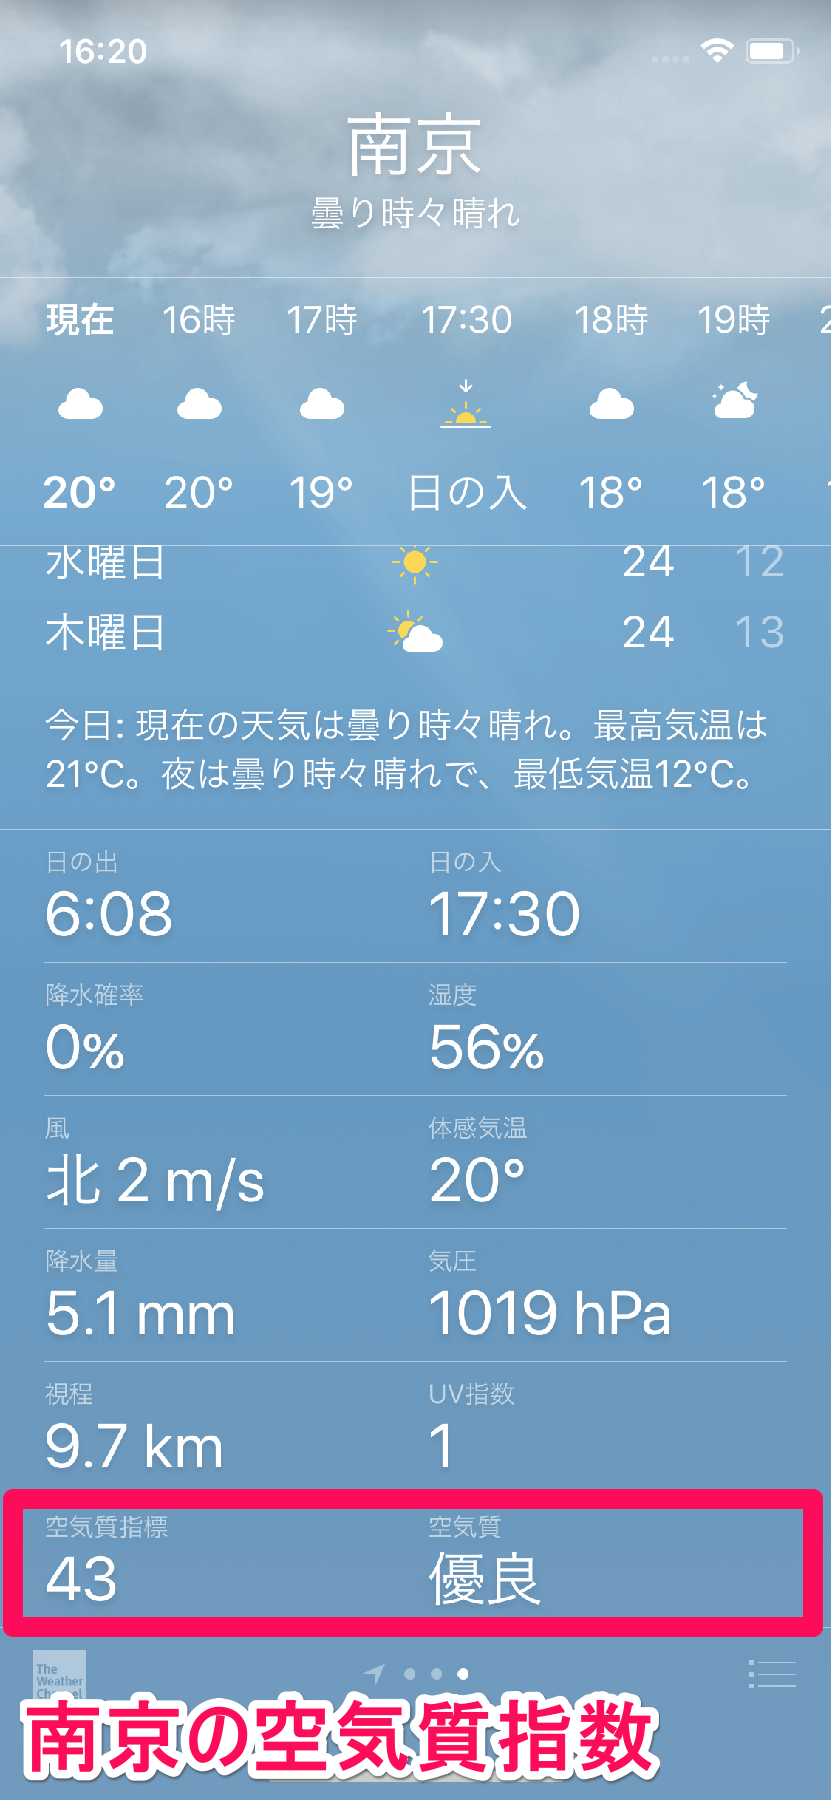 iPhone(アイフォーン、アイフォン)の天気アプリで南京(中国)の空気質指数と空気質を表示した画面